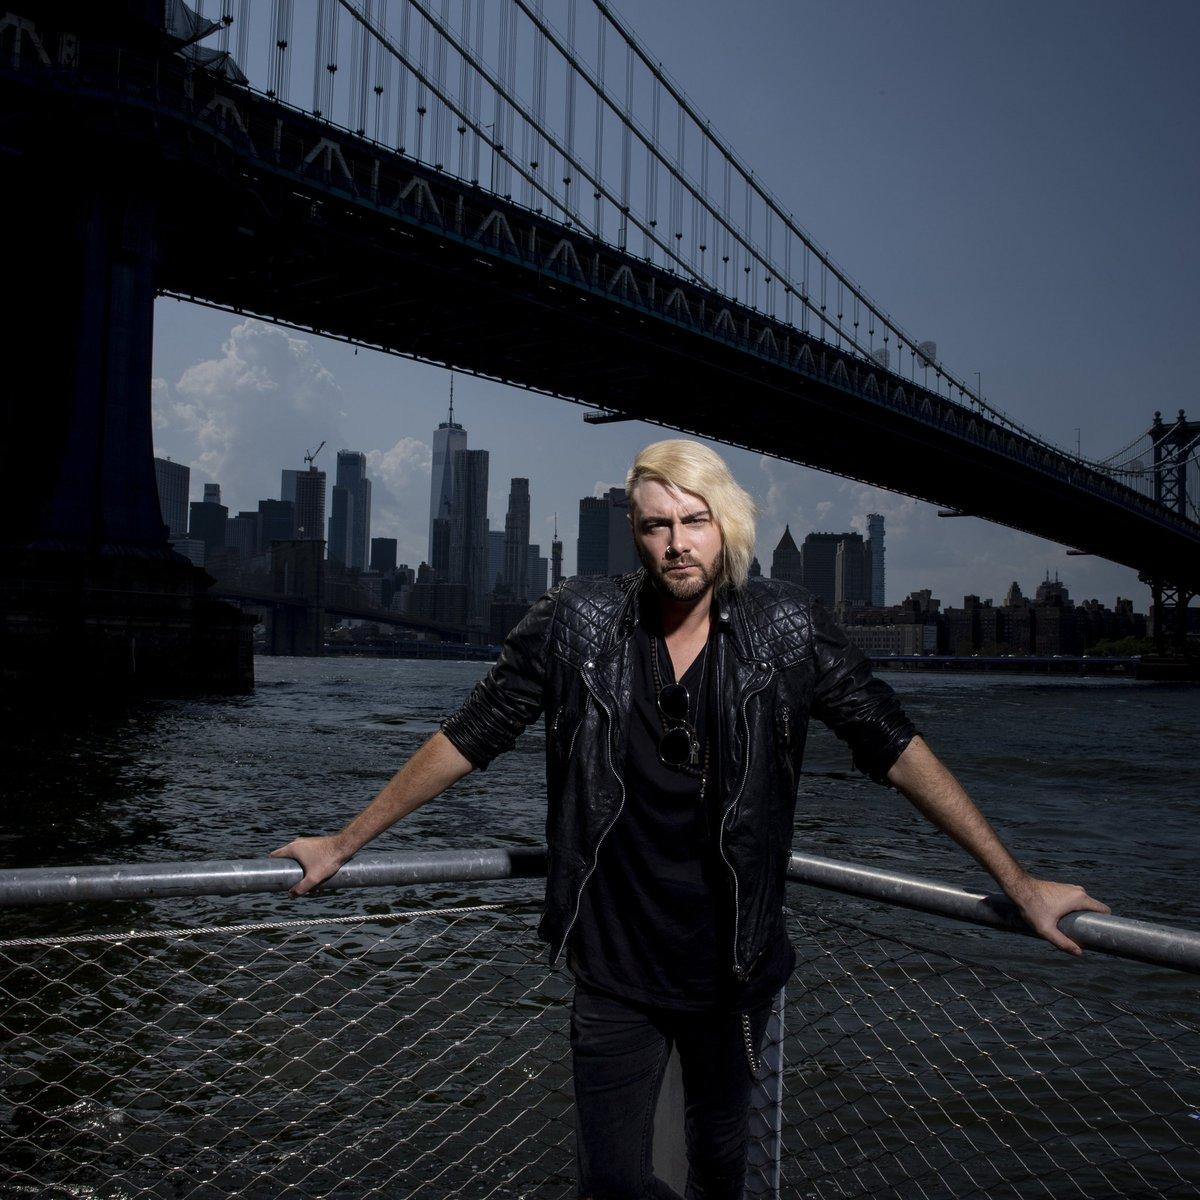 Happy Birthday MJ❗  📸 @mcmurtrie  #TRA #theravenage #happybirthday #mattjames #mj #newyork #nyc #mcmurtrie